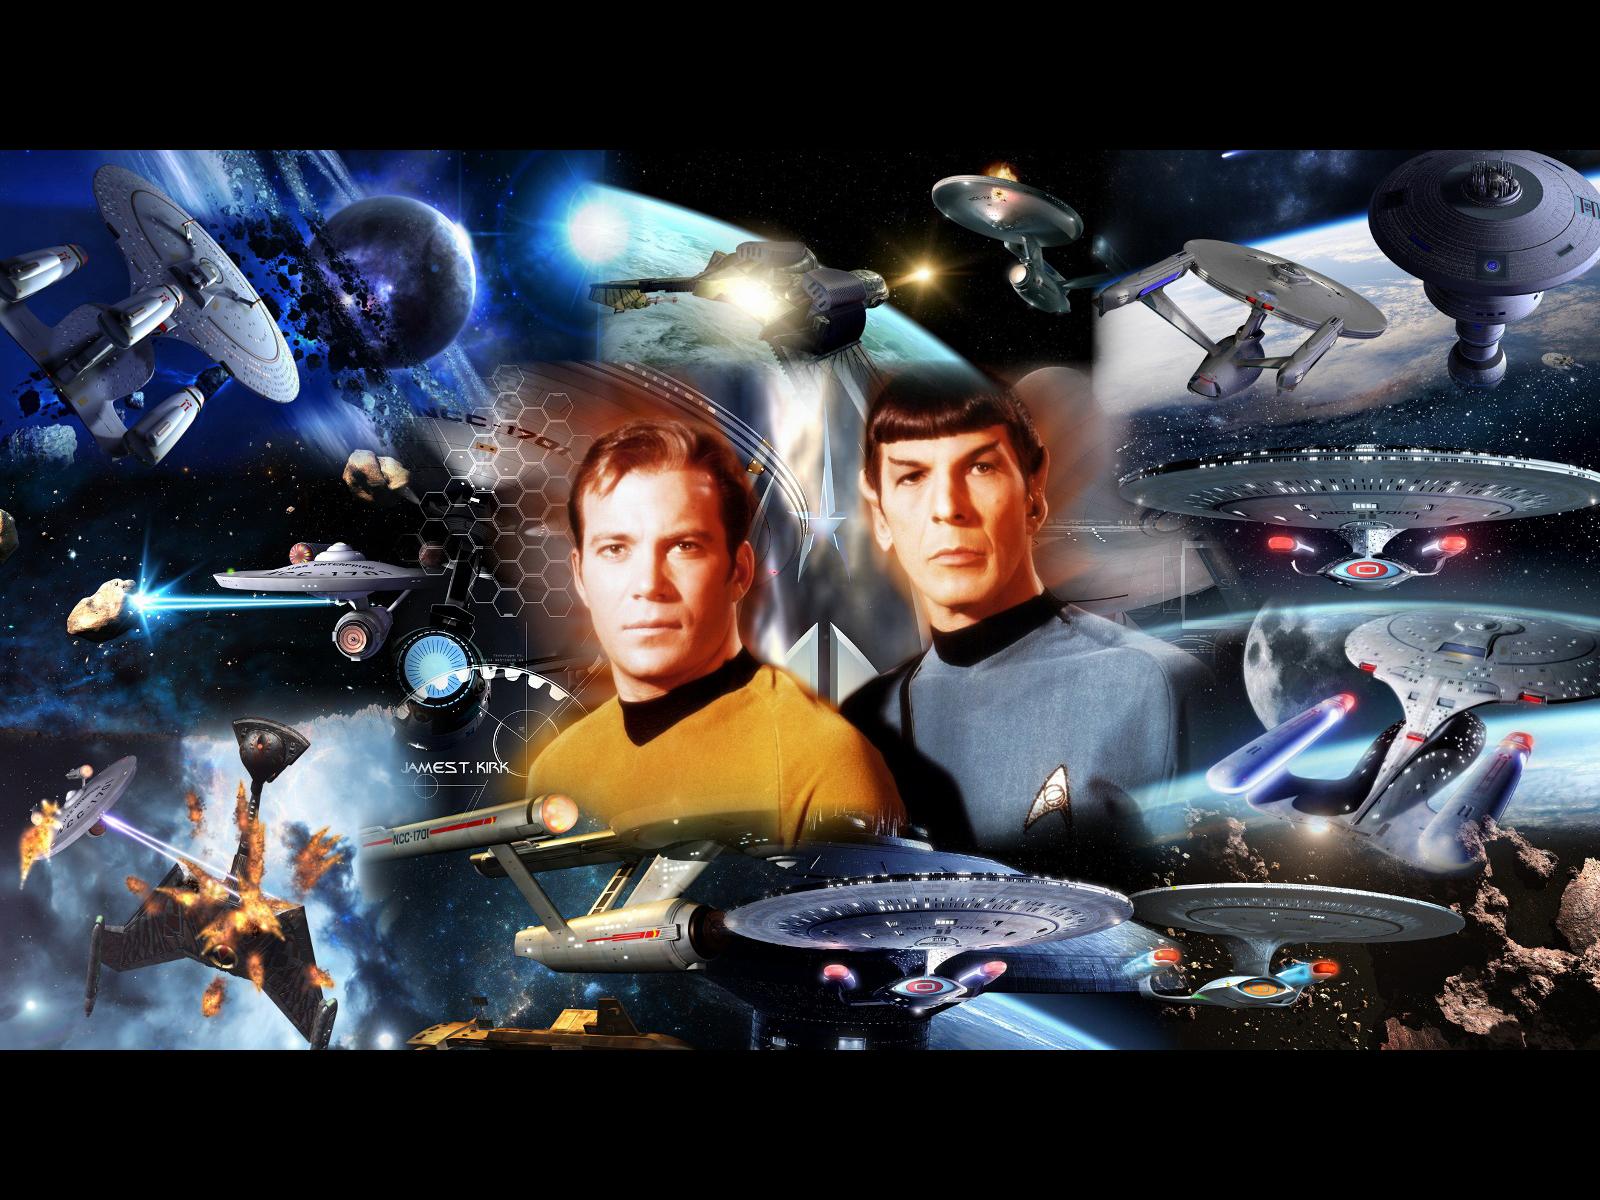 Star Trek Collage Wallpaper Star Trek computer desktop wallpaper 1600x1200